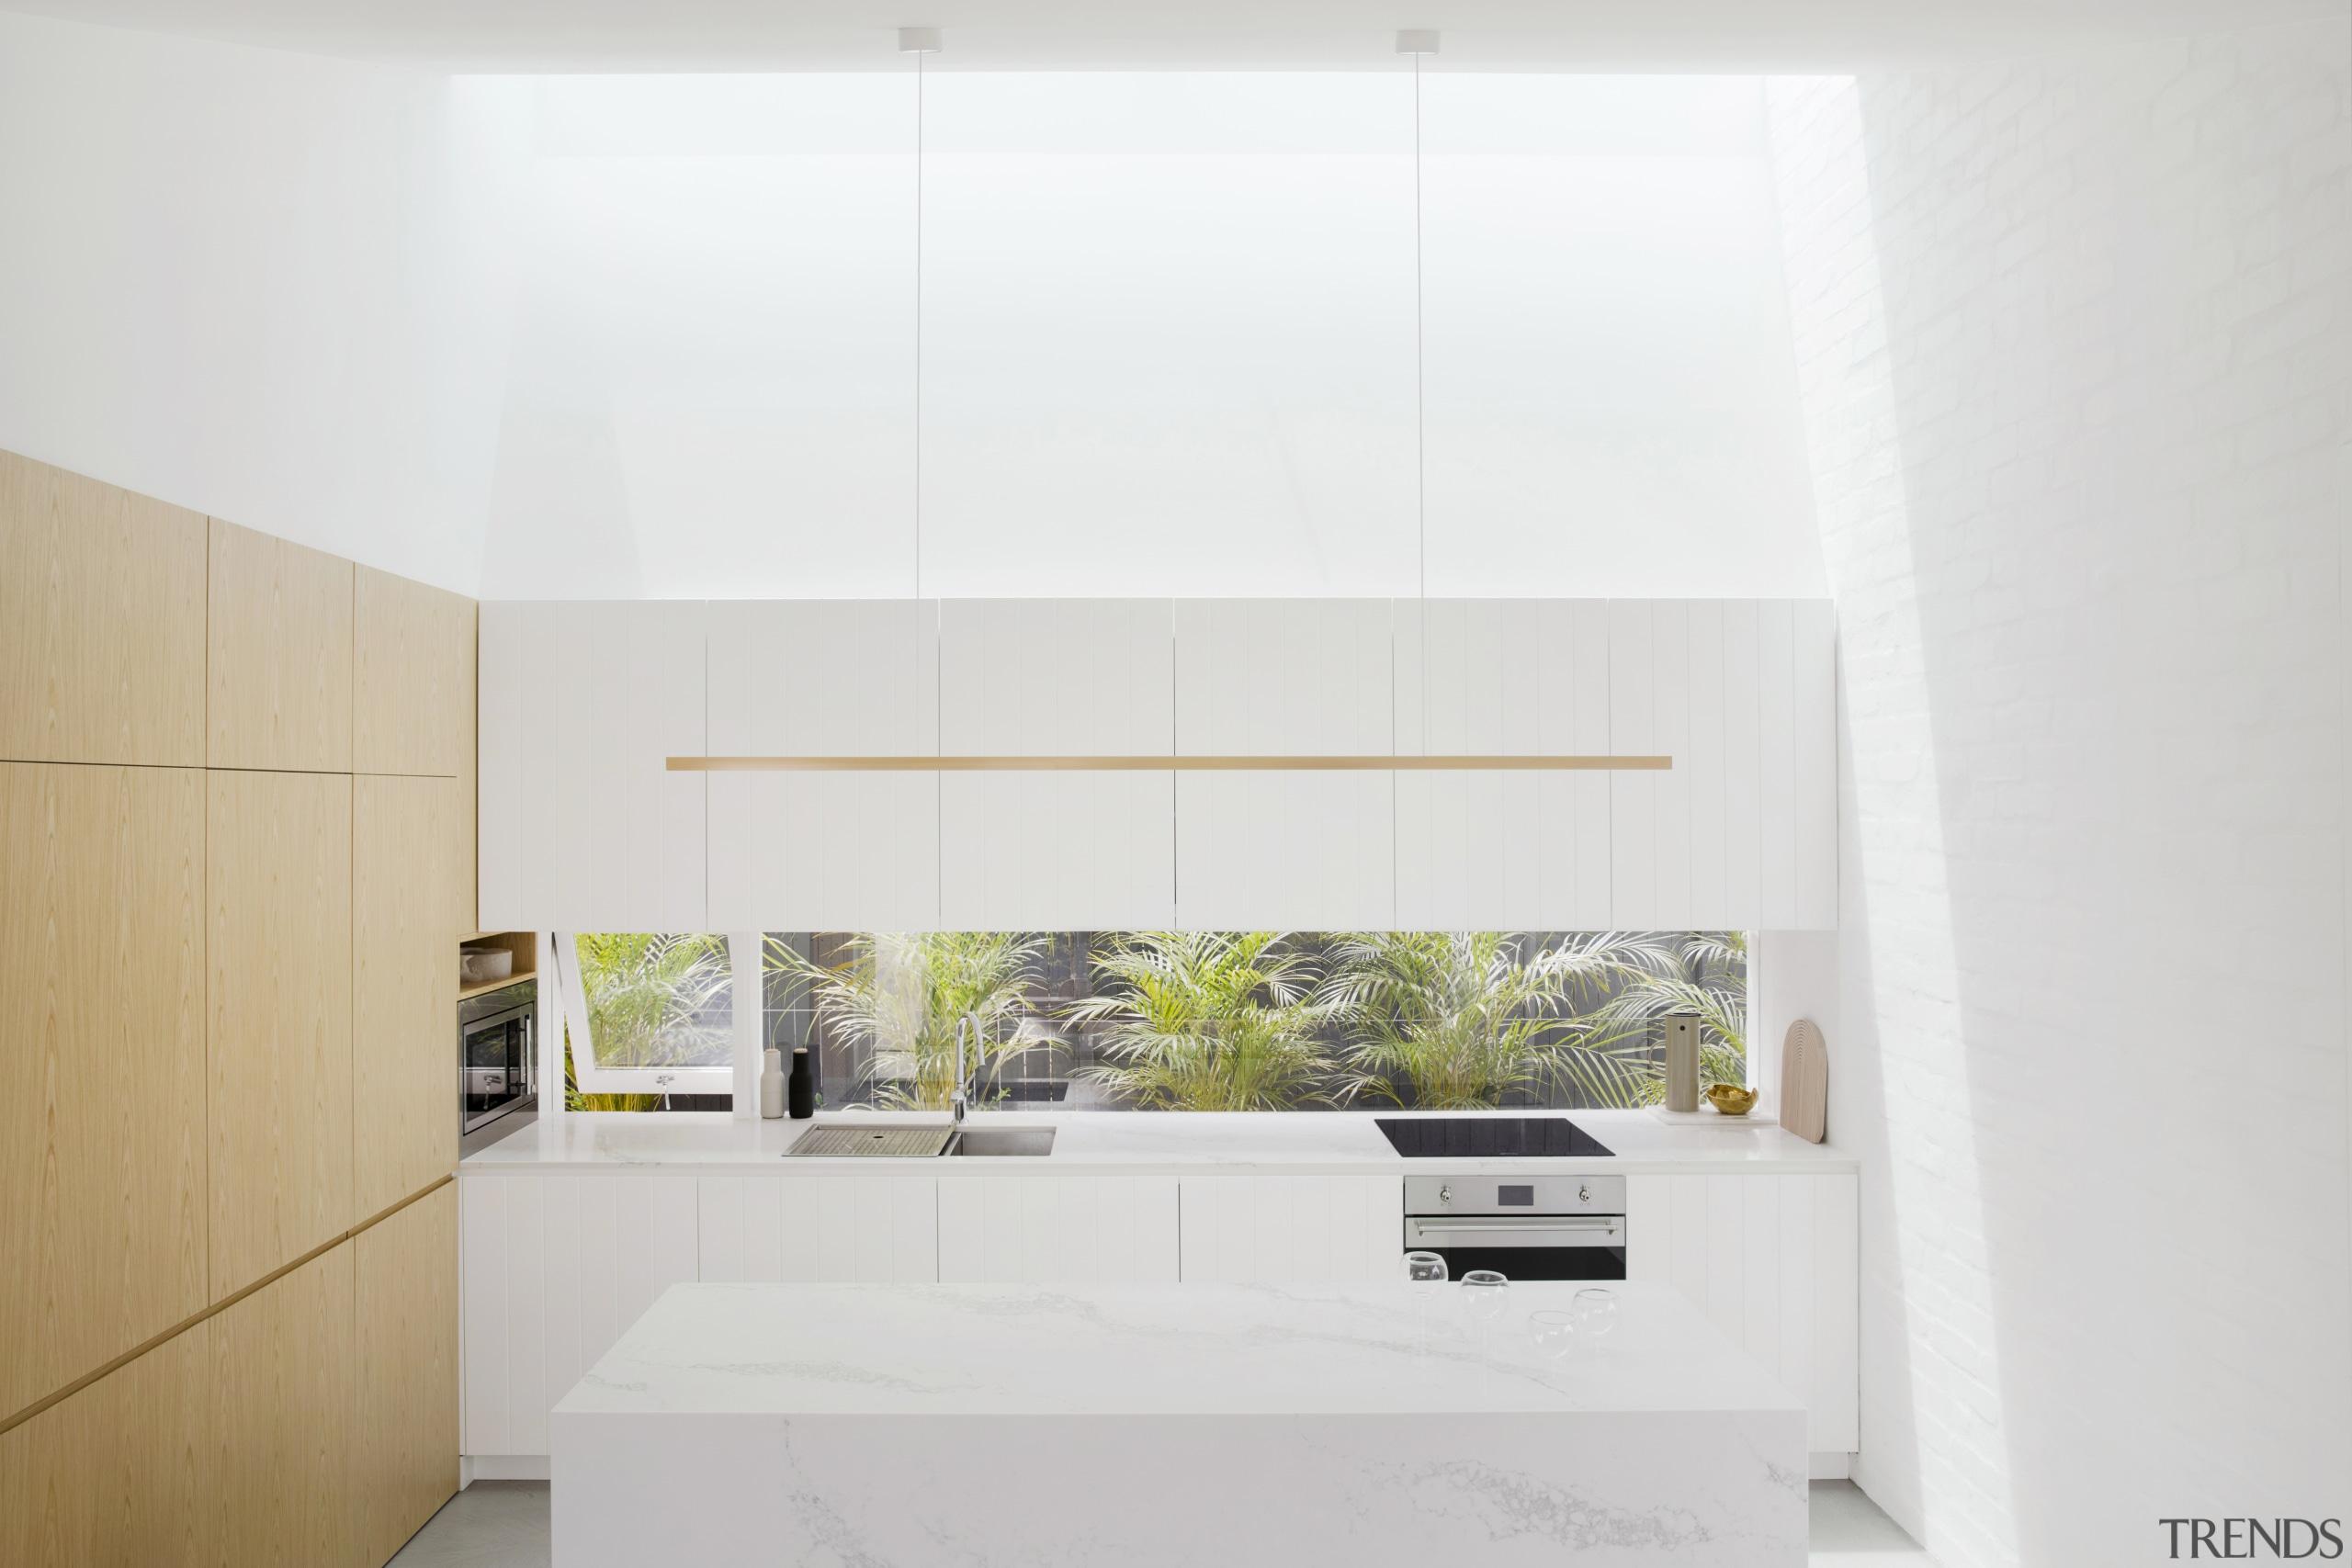 The small side window beside the glass splashback architecture, house, interior design, kitchen, white, kitchen island,  studio prineas